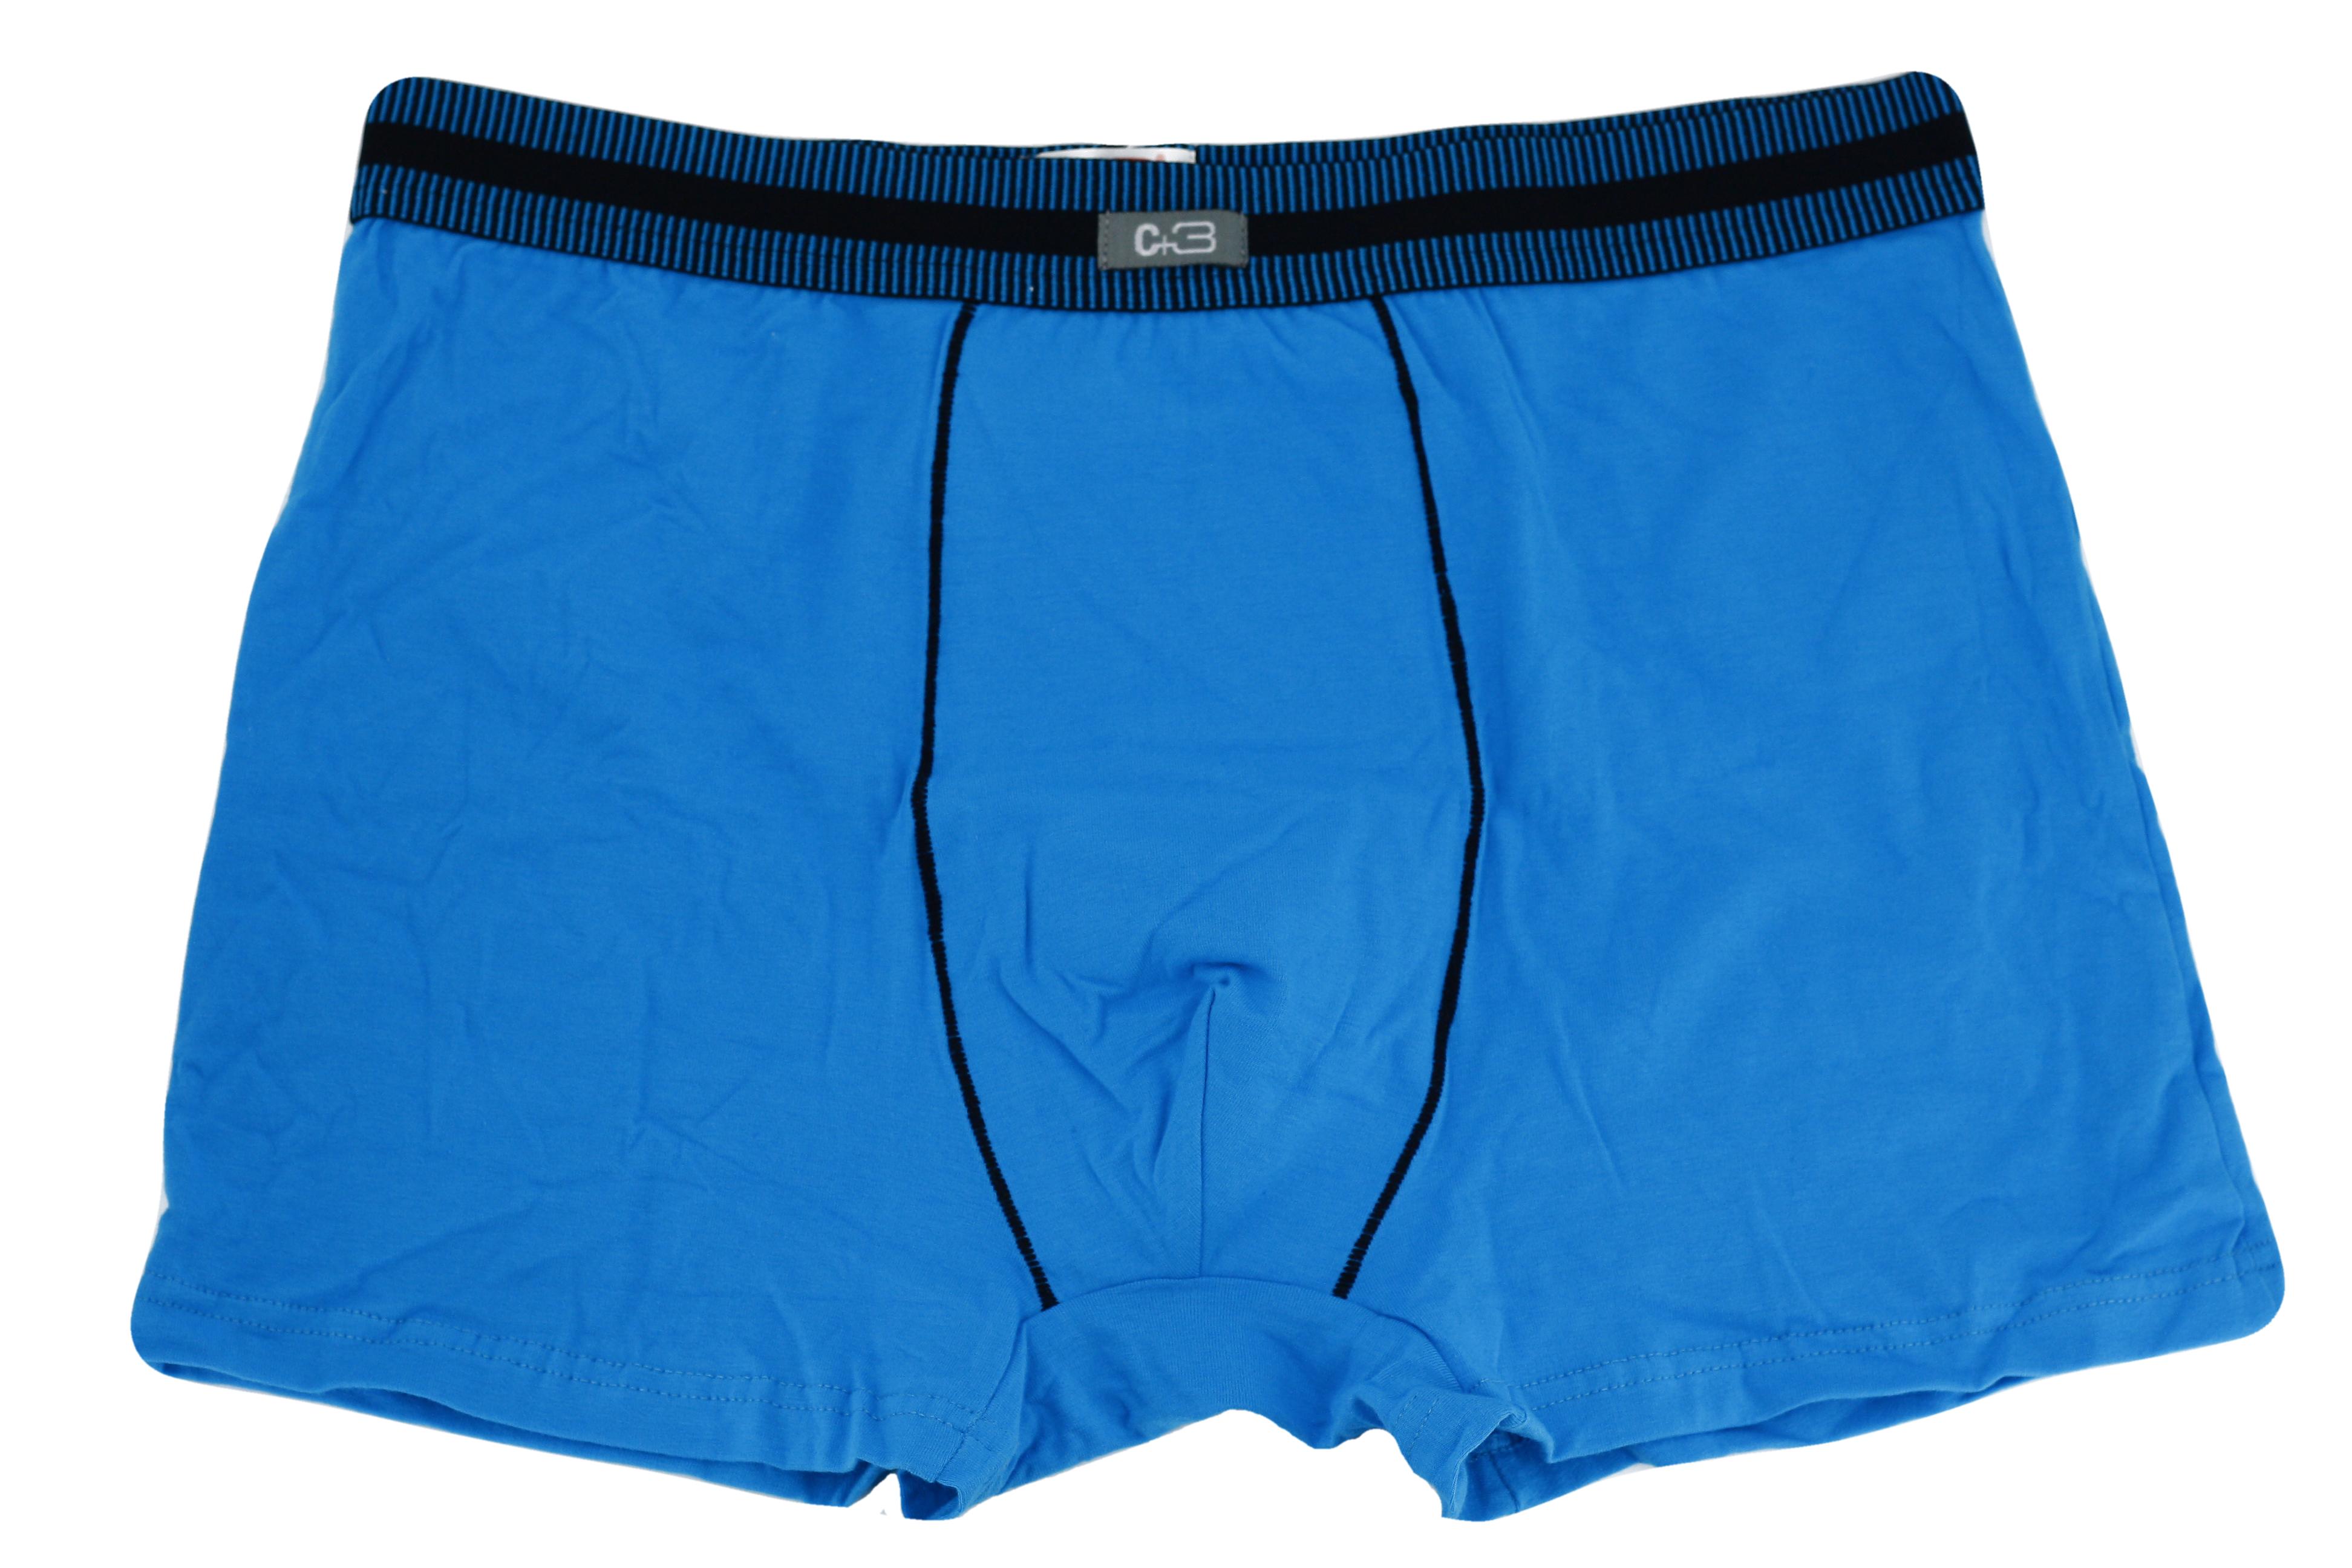 Pánské boxerky Premium VBE-037 - C+3 - Světle modrá/2XL